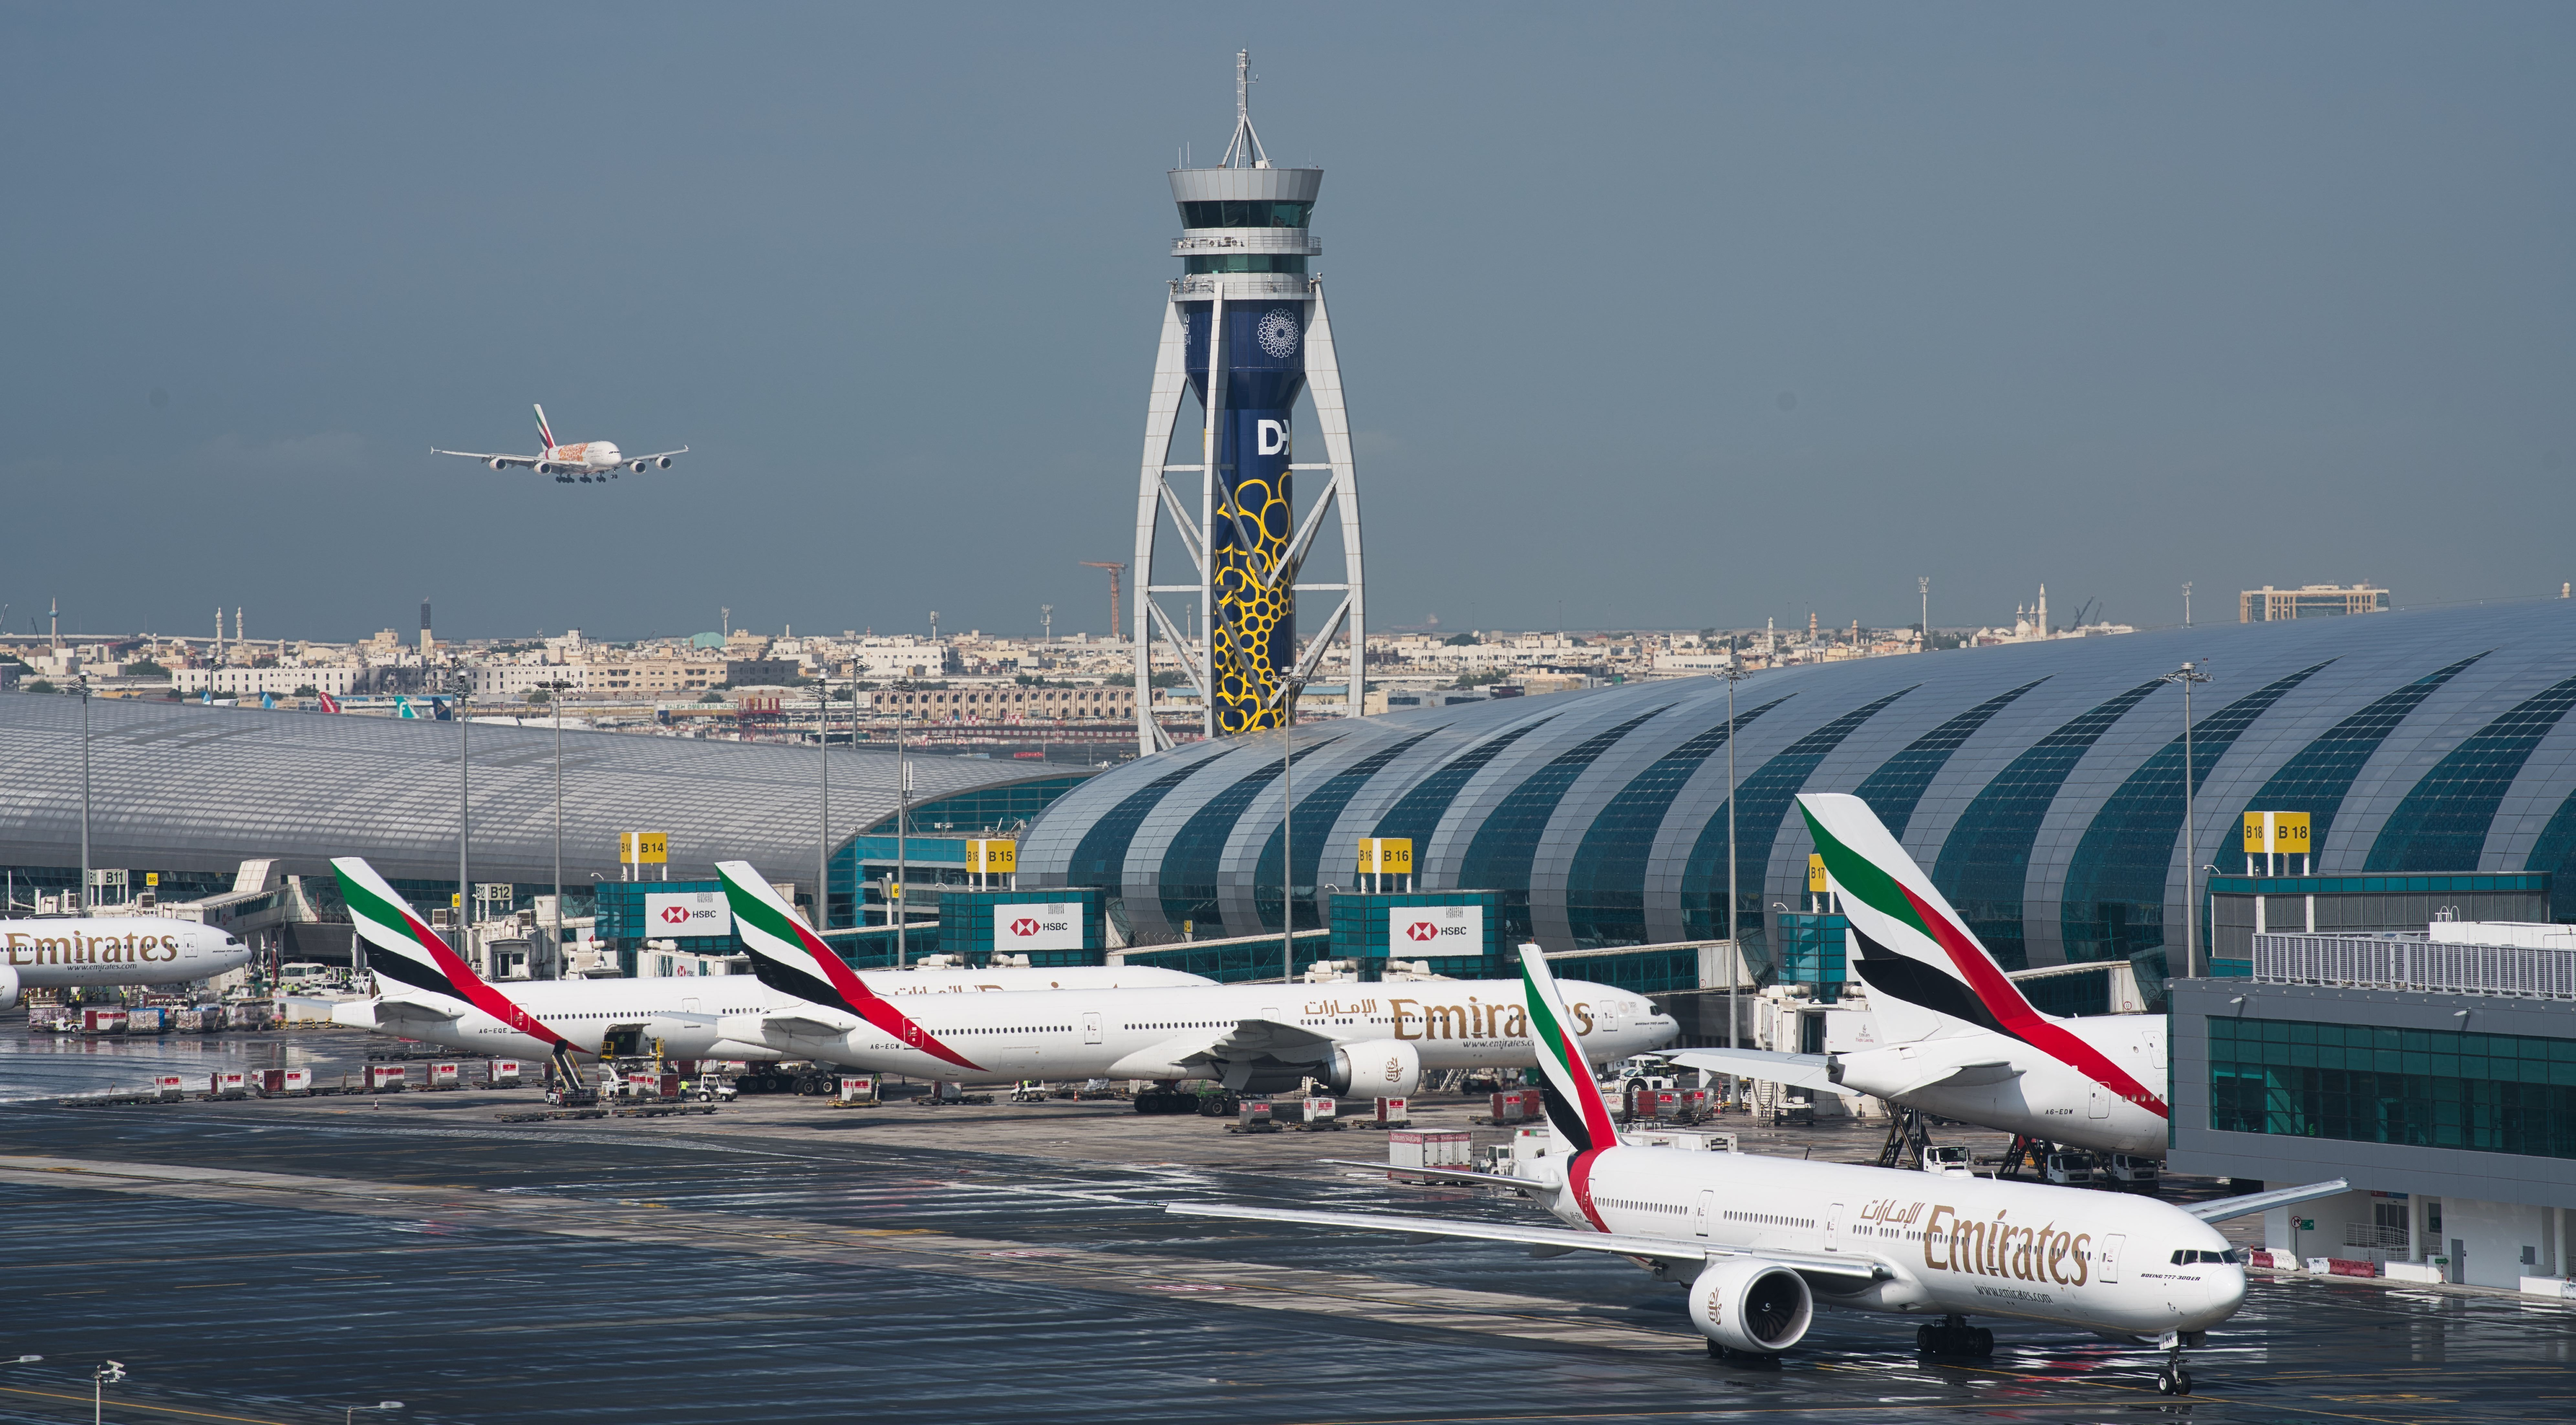 An Emirates jetliner comes in for landing at Dubai International Airport in Dubai, United Arab Emirates, on Dec. 11, 2019.